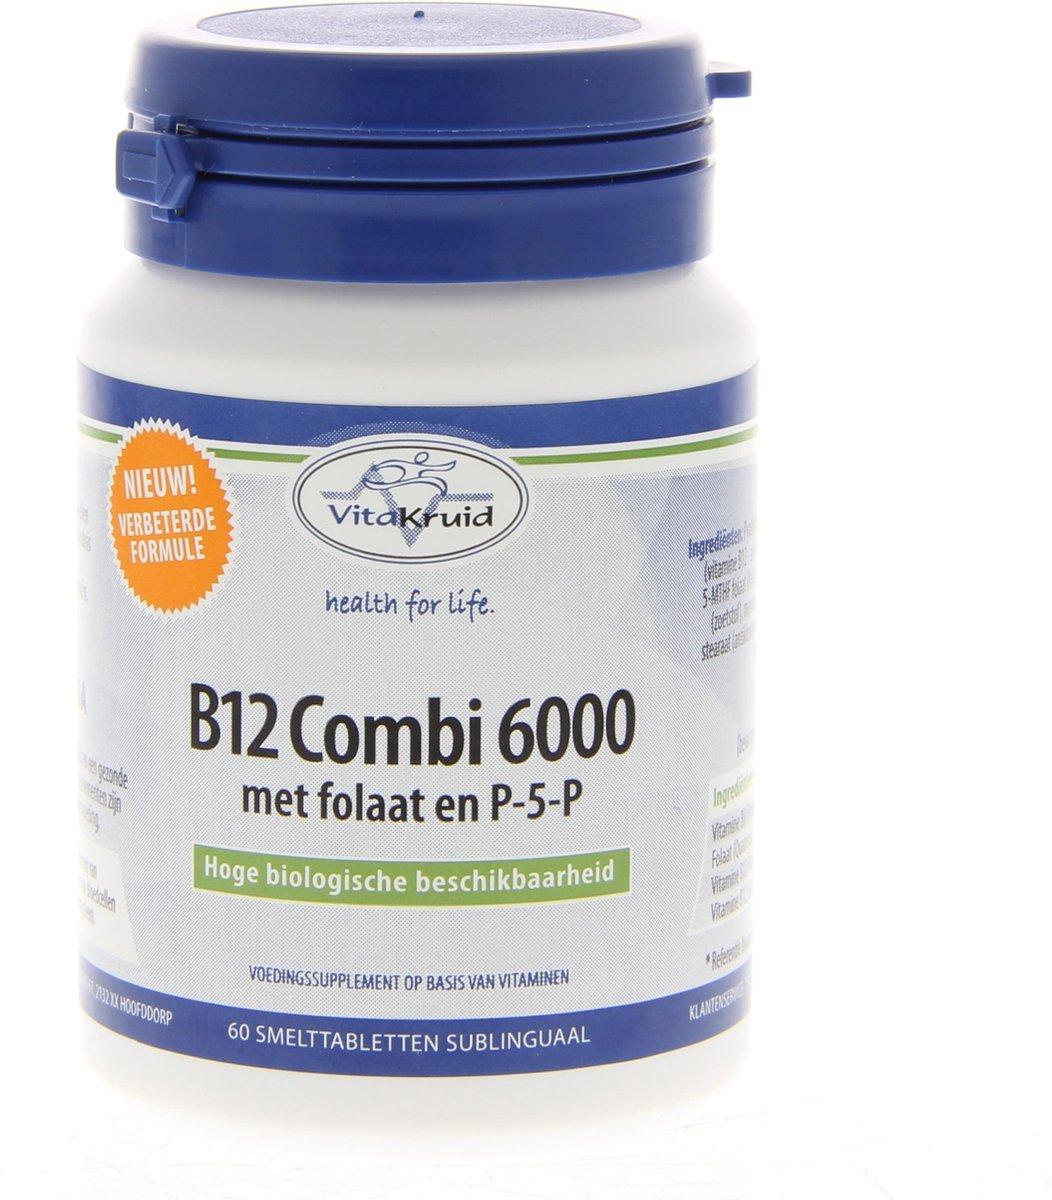 Vitakruid Combi 6000 60 smelttabletten